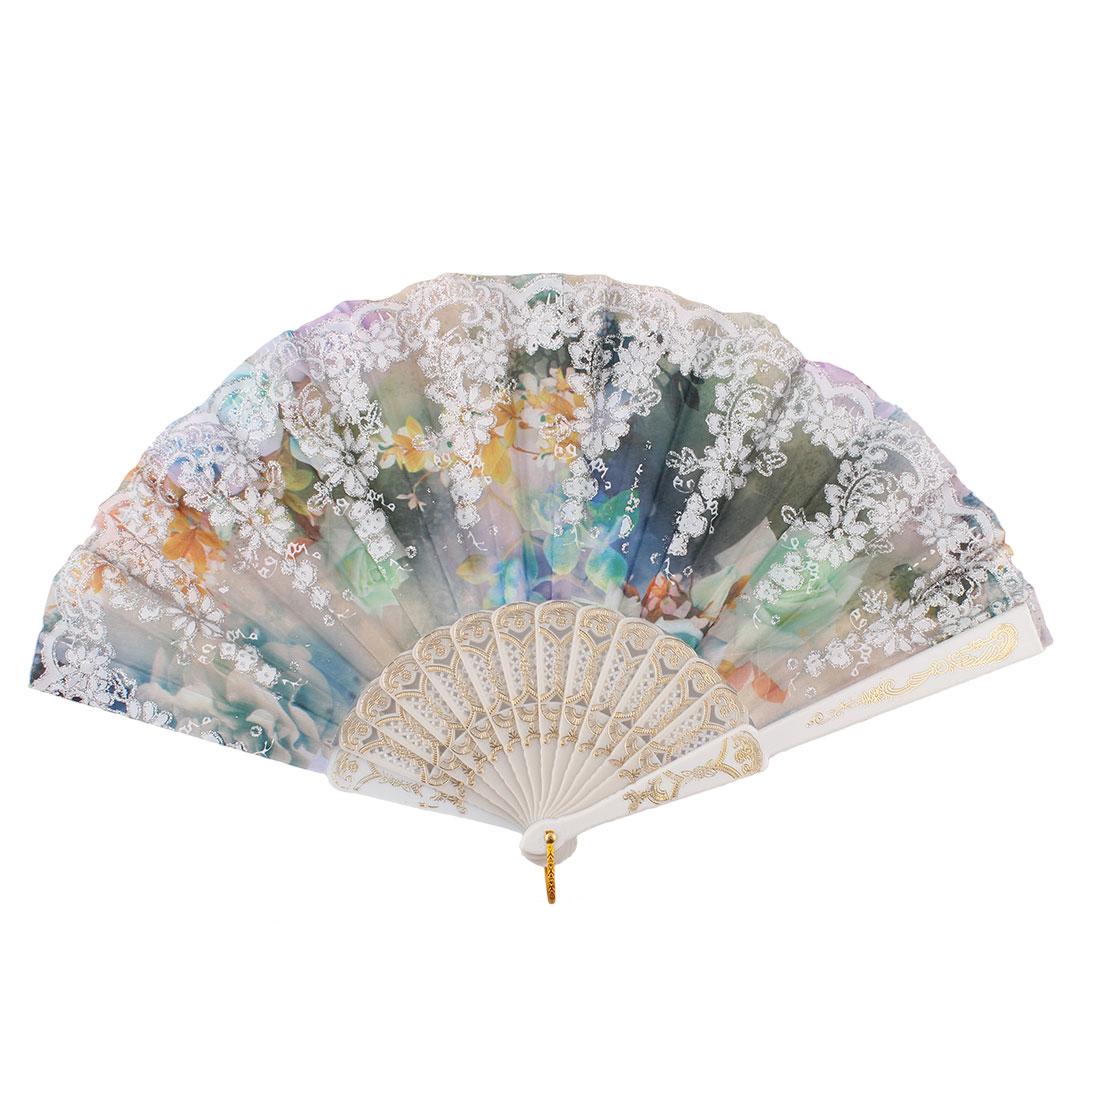 Chinese Style Glitter Powder Flower Pattern Wedding Decor Plastic Frame Nylon Fabric Folding Hand Fan